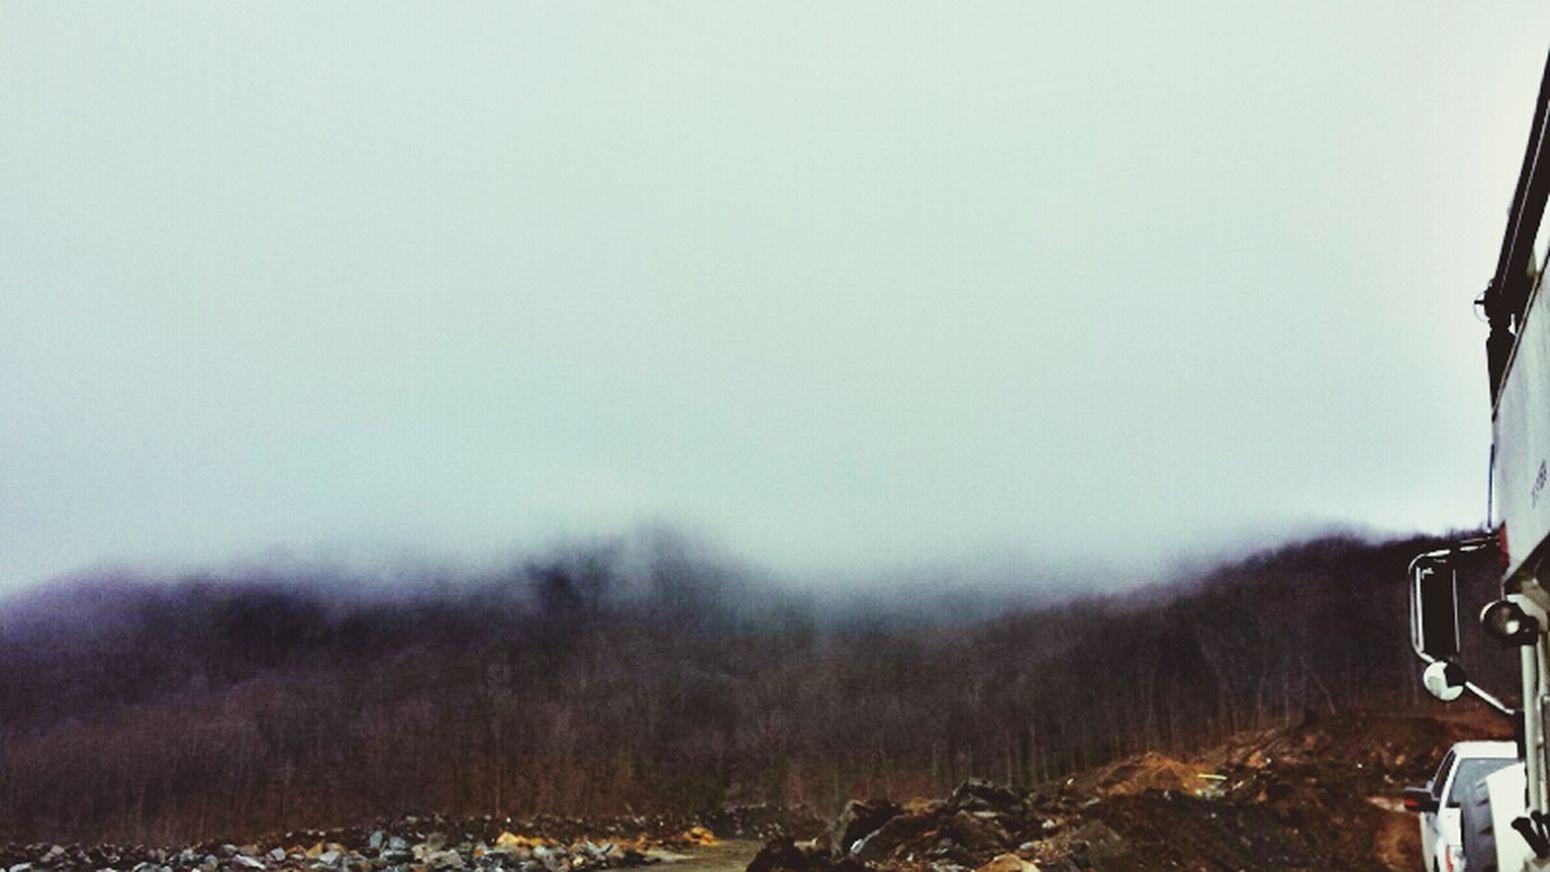 Foggy Morning At Work